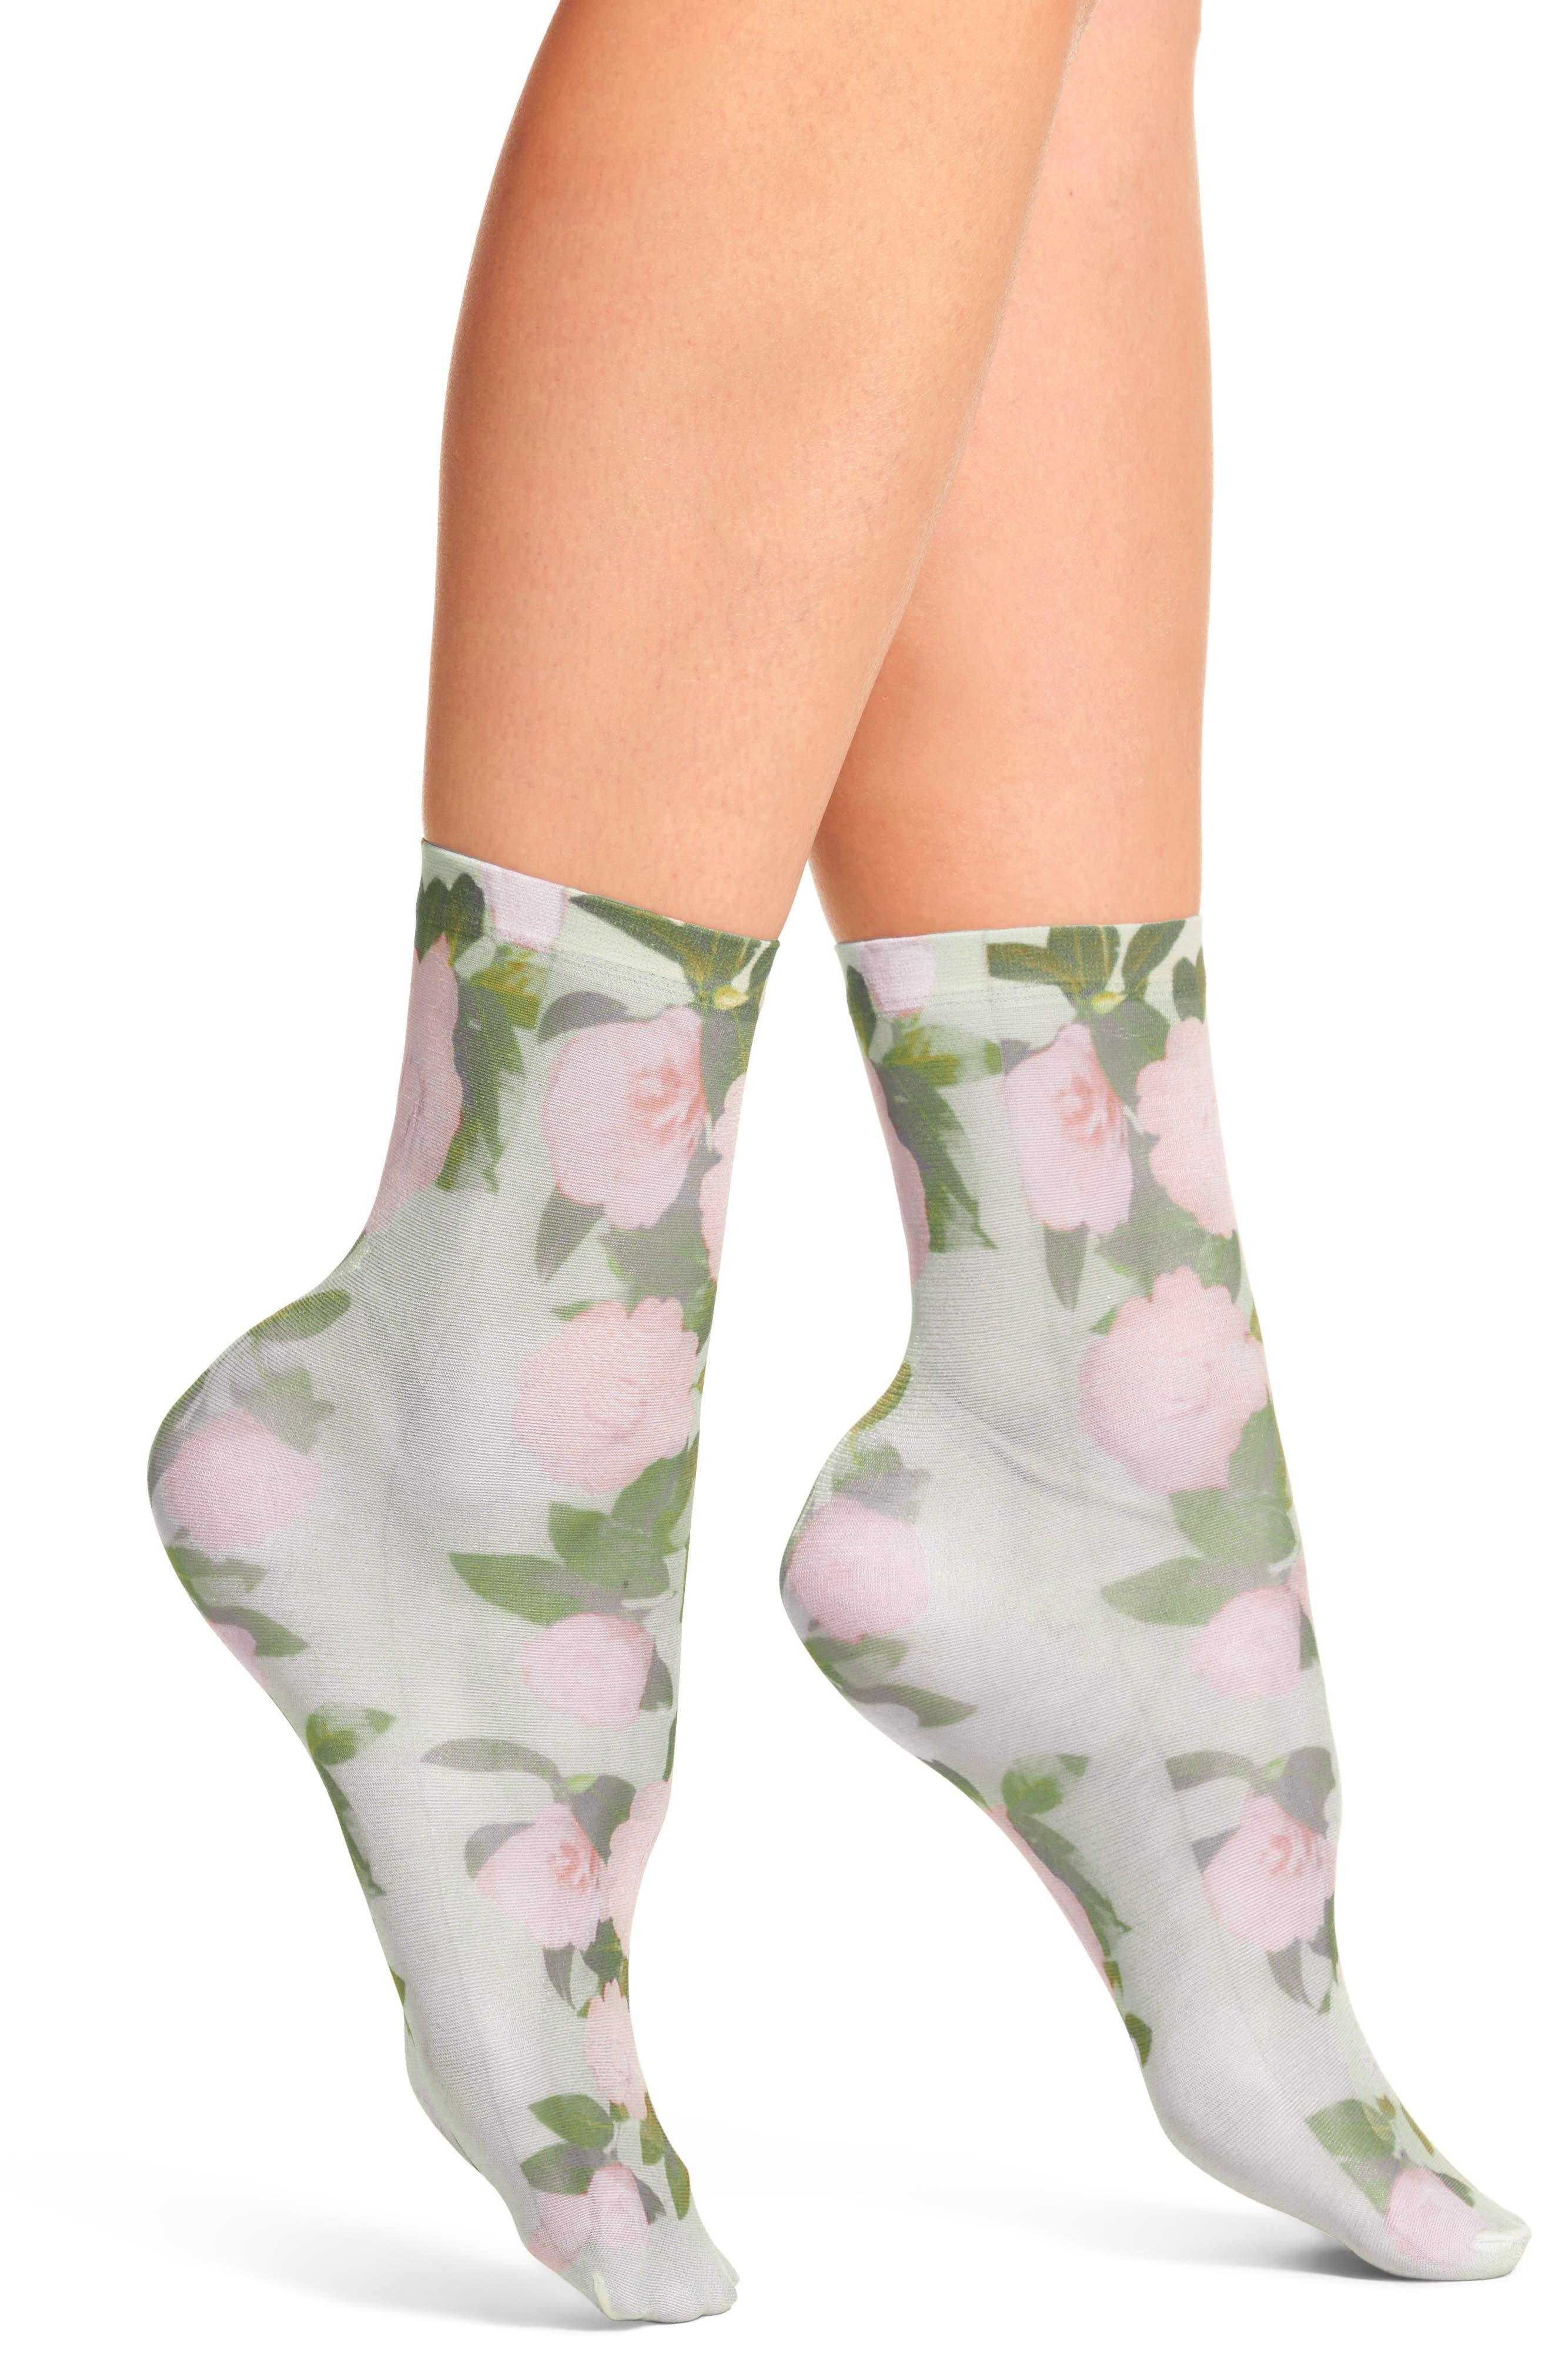 Damiana Ankle Socks,                             Main thumbnail 1, color,                             400